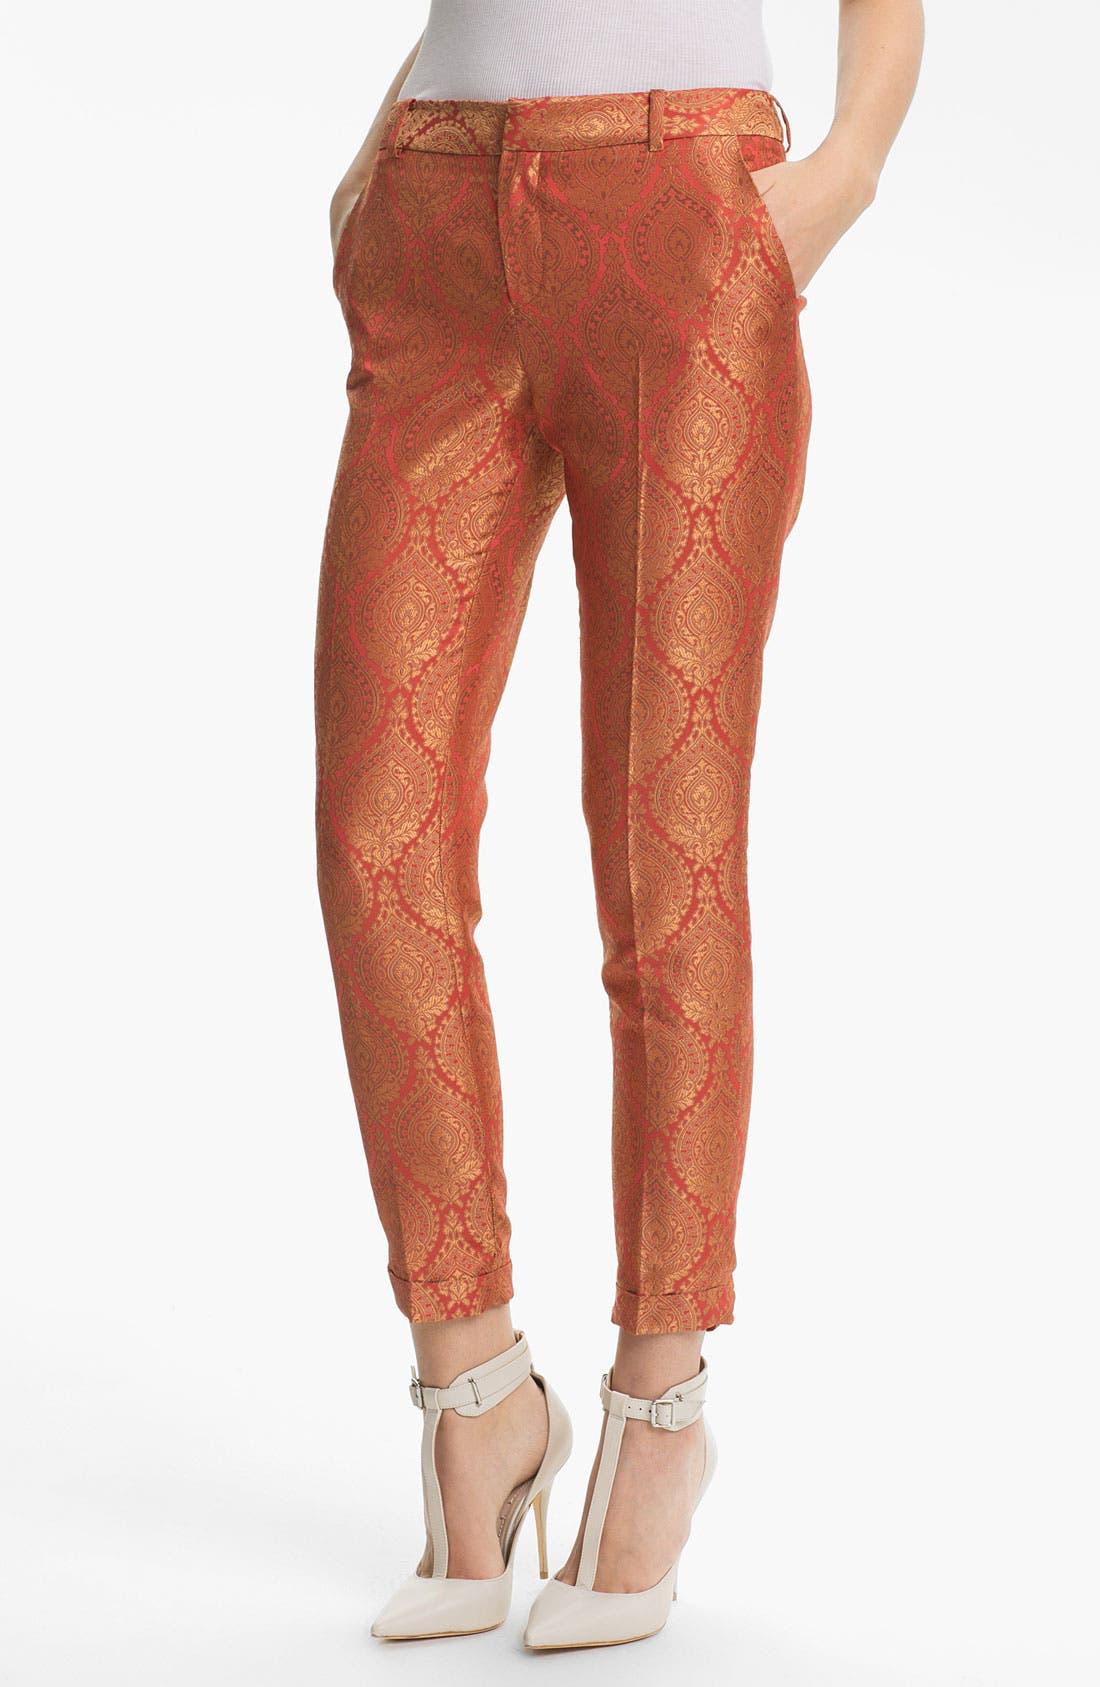 Alternate Image 1 Selected - Elizabeth and James 'Anselm' Metallic Jacquard Trousers